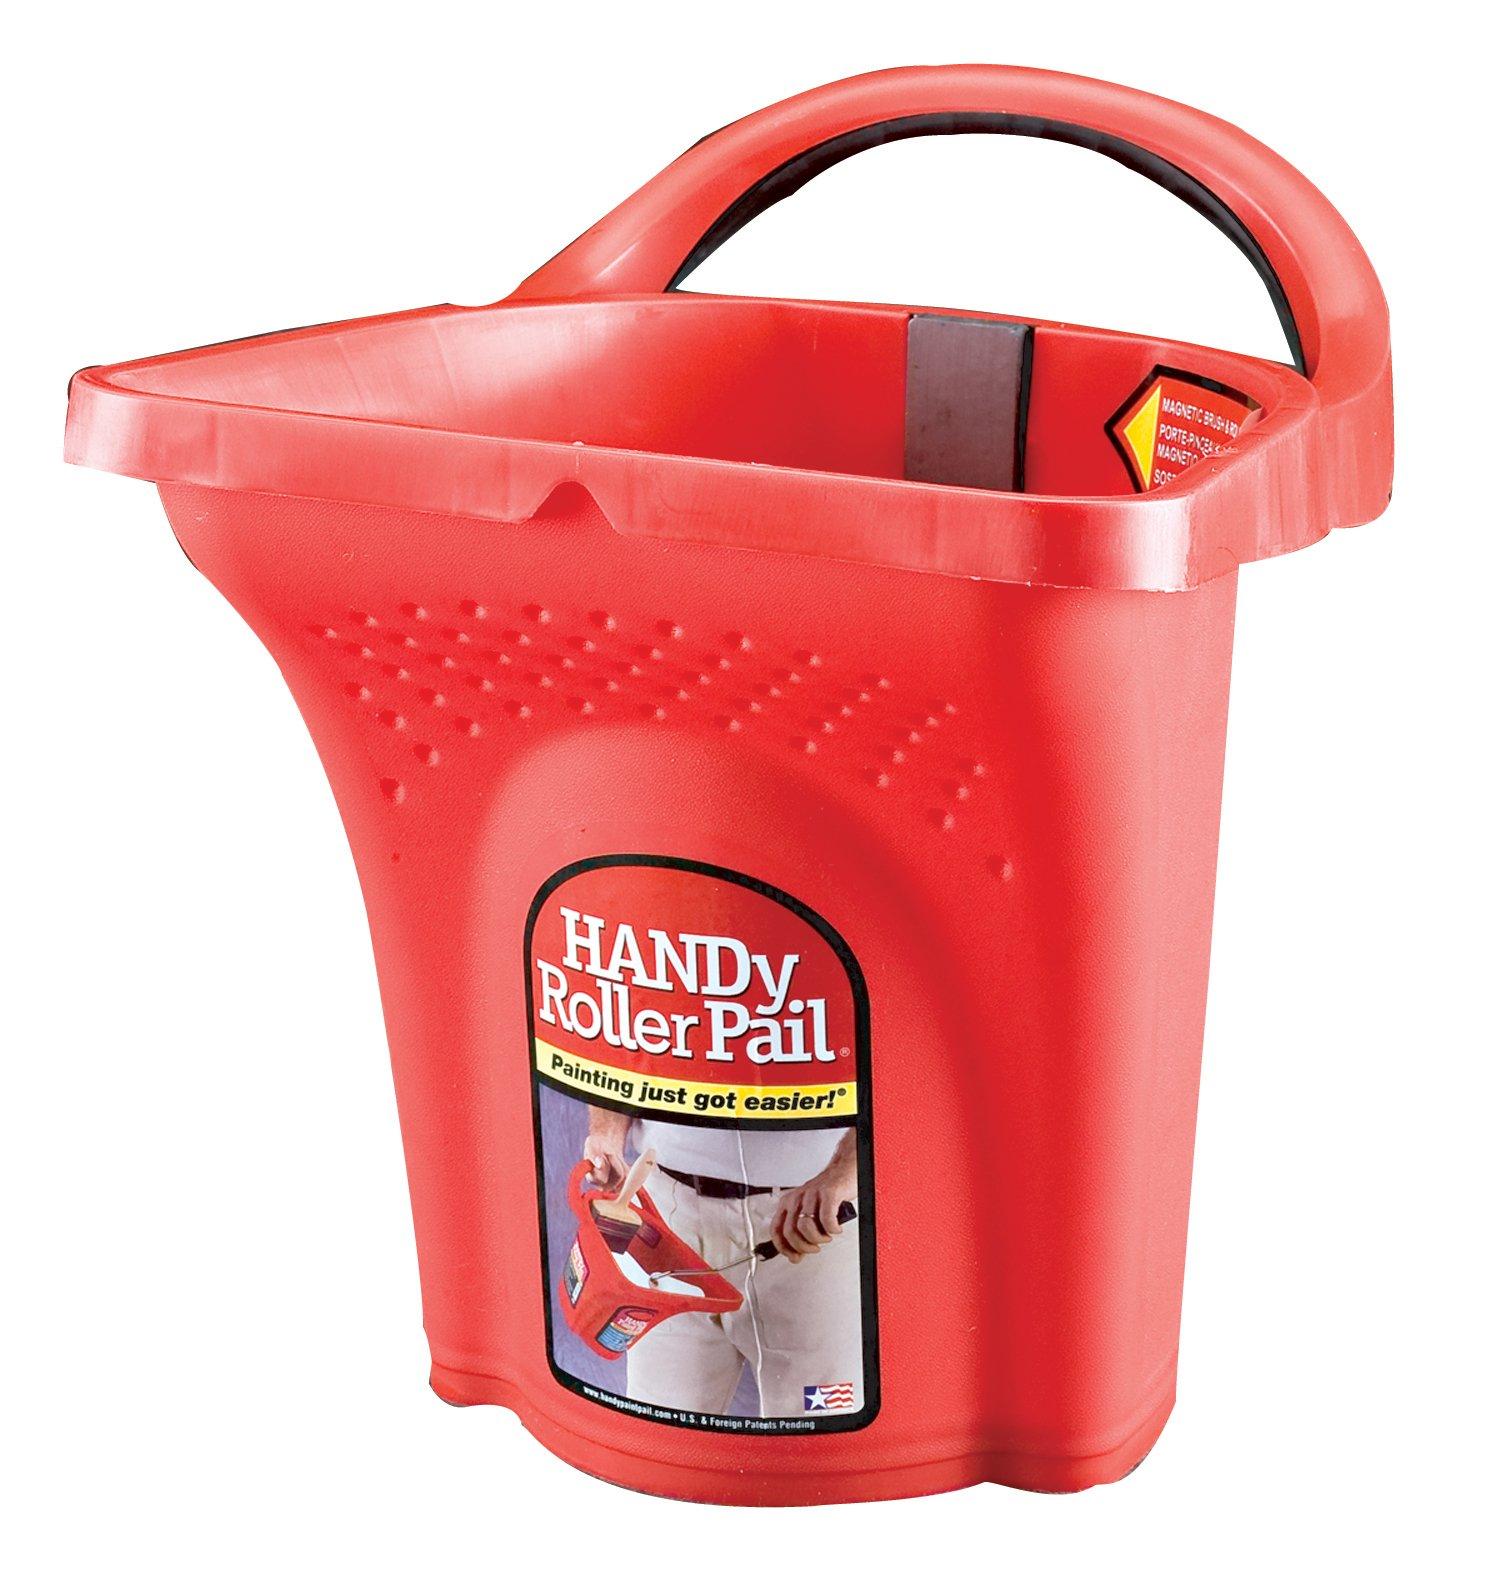 HANDy Roller Pail - Bulk 6 Pack by Handy Paint Pail